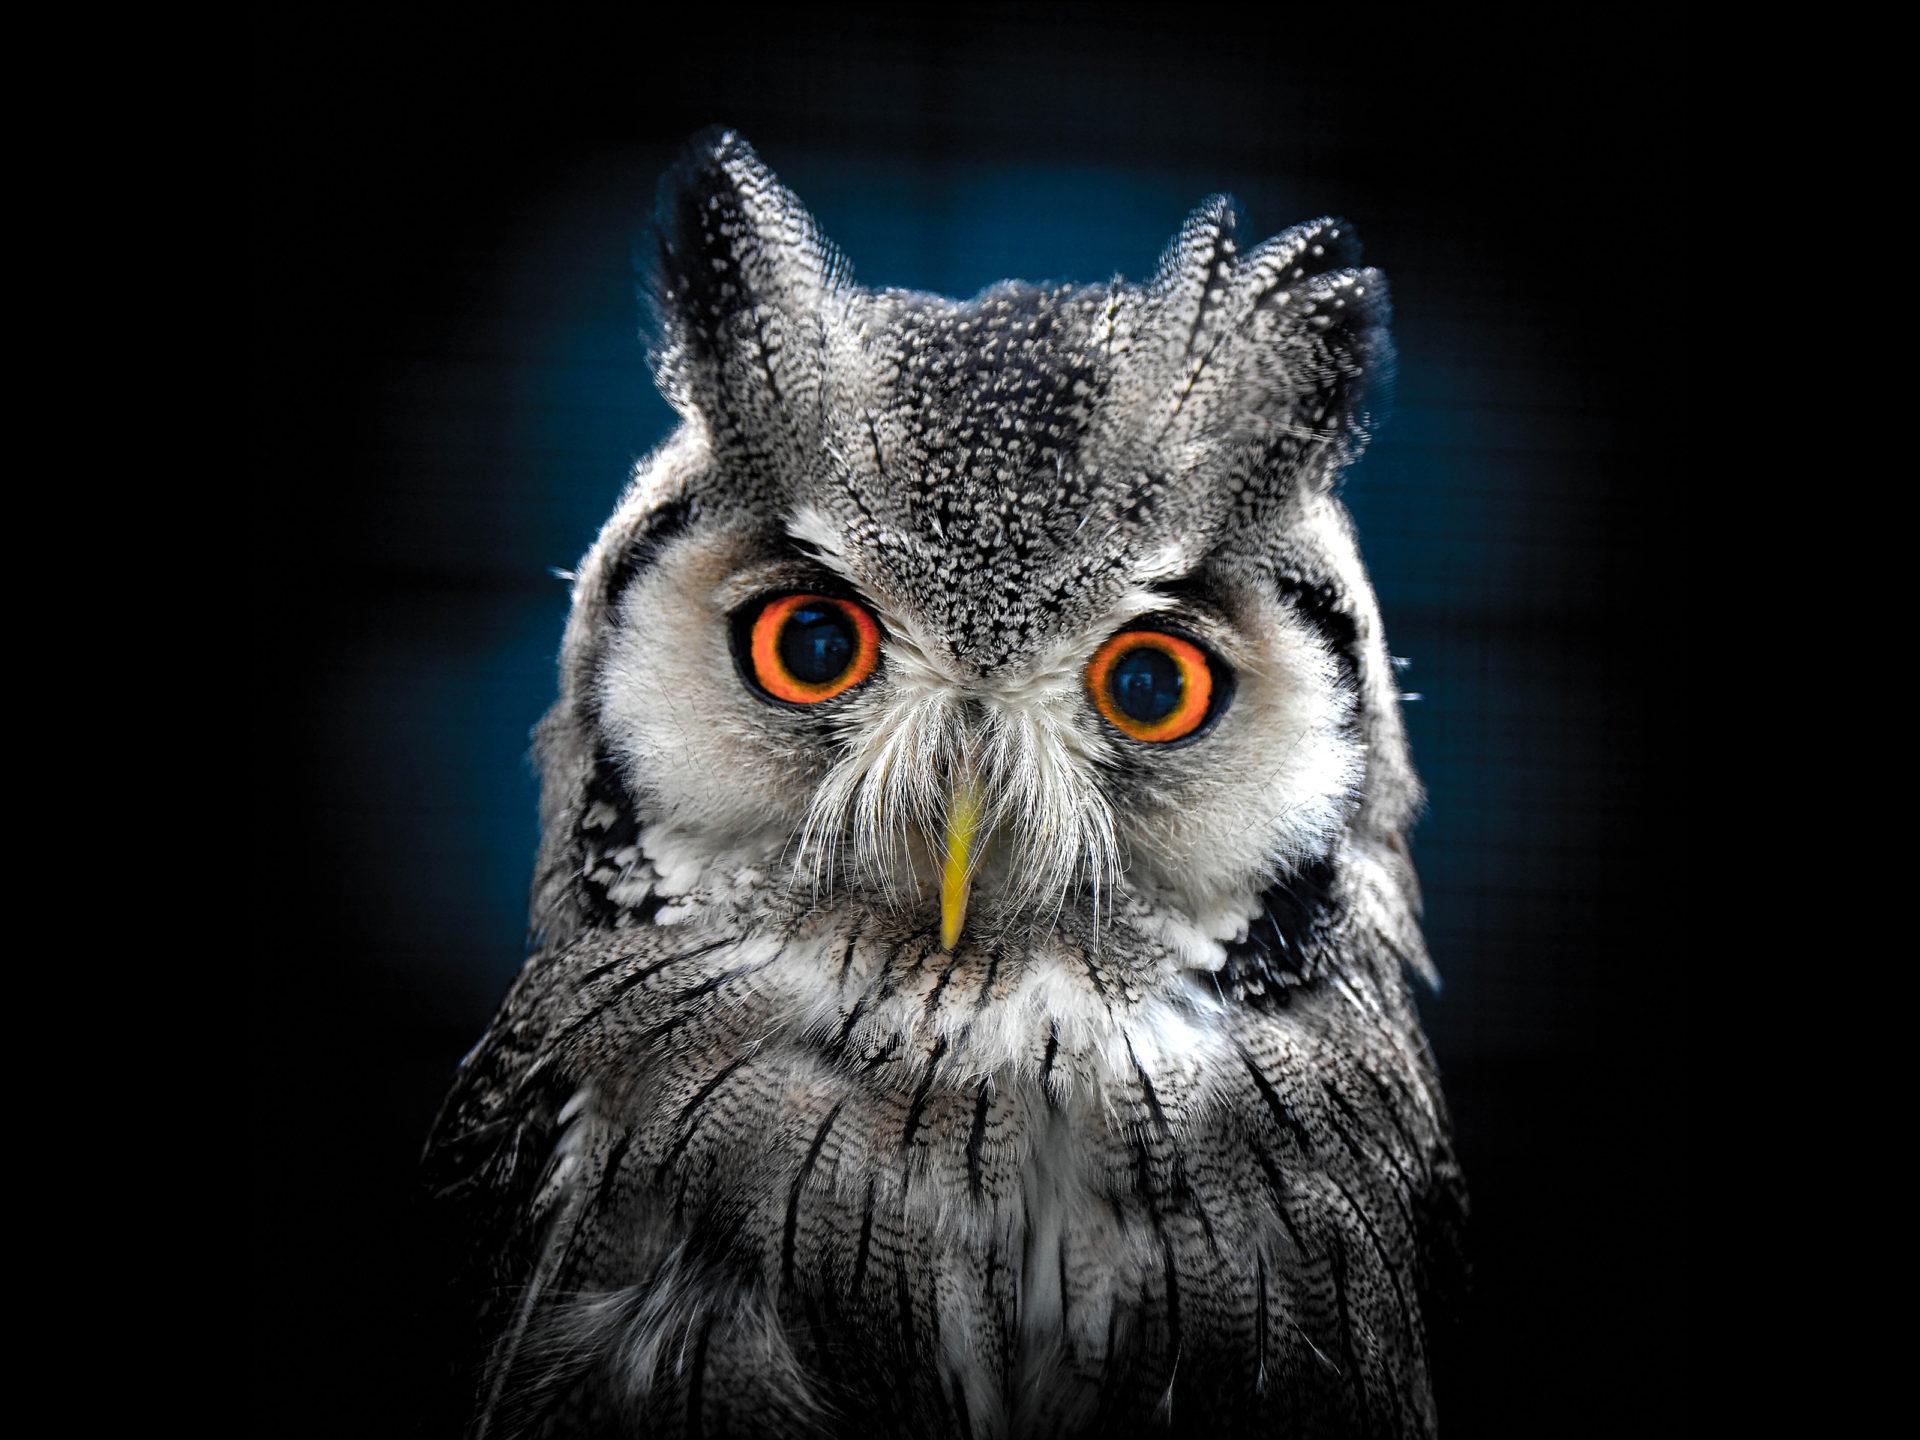 Cute But Sad Wallpaper Owl Wallpaper Best Wallpaper Hd For Desktop Wallpapers13 Com